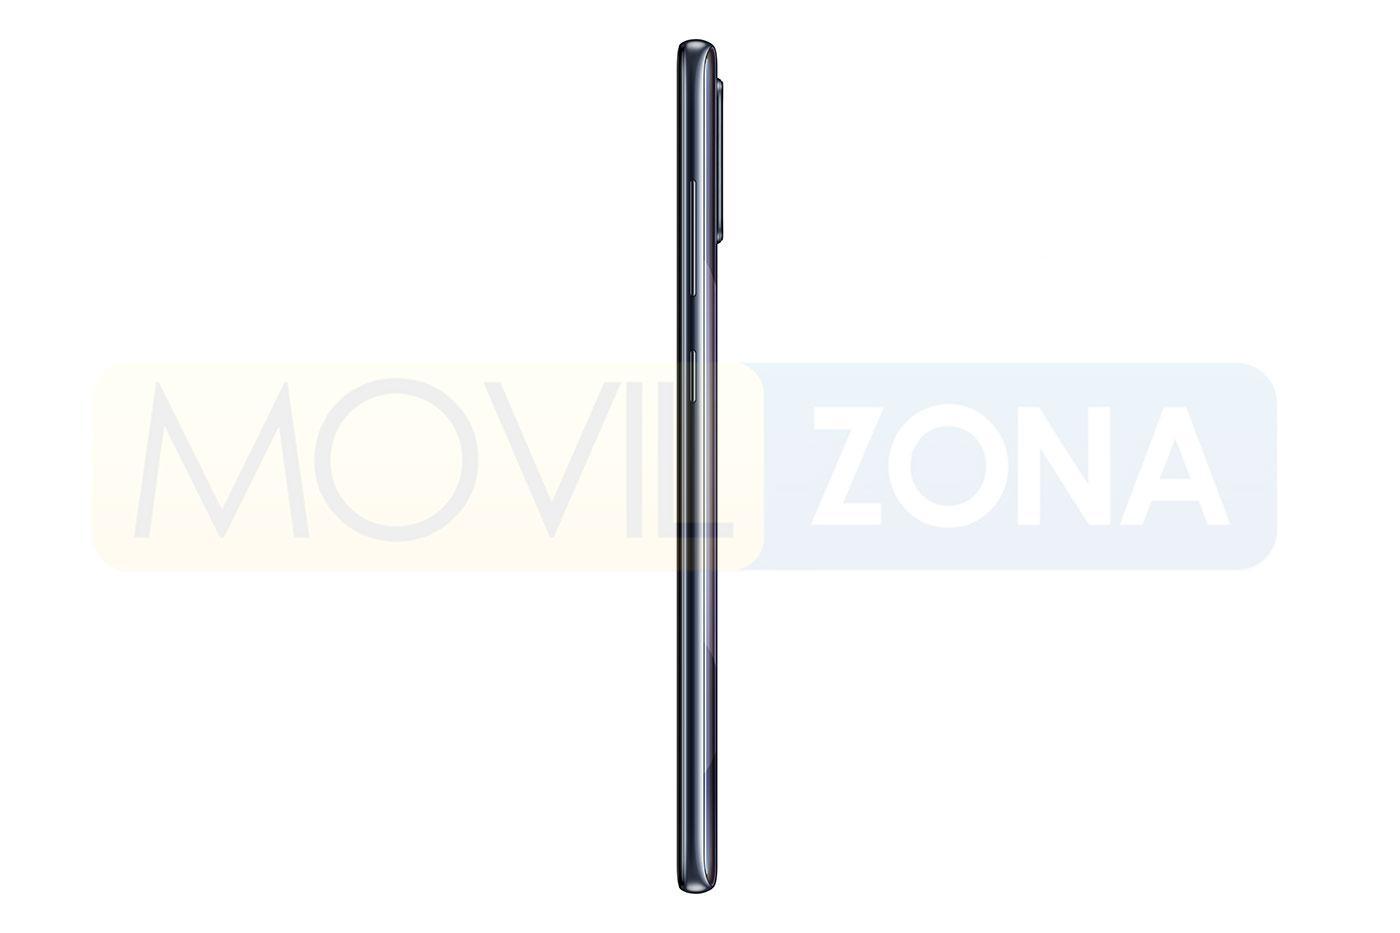 Samsung Galaxy A71 perfil